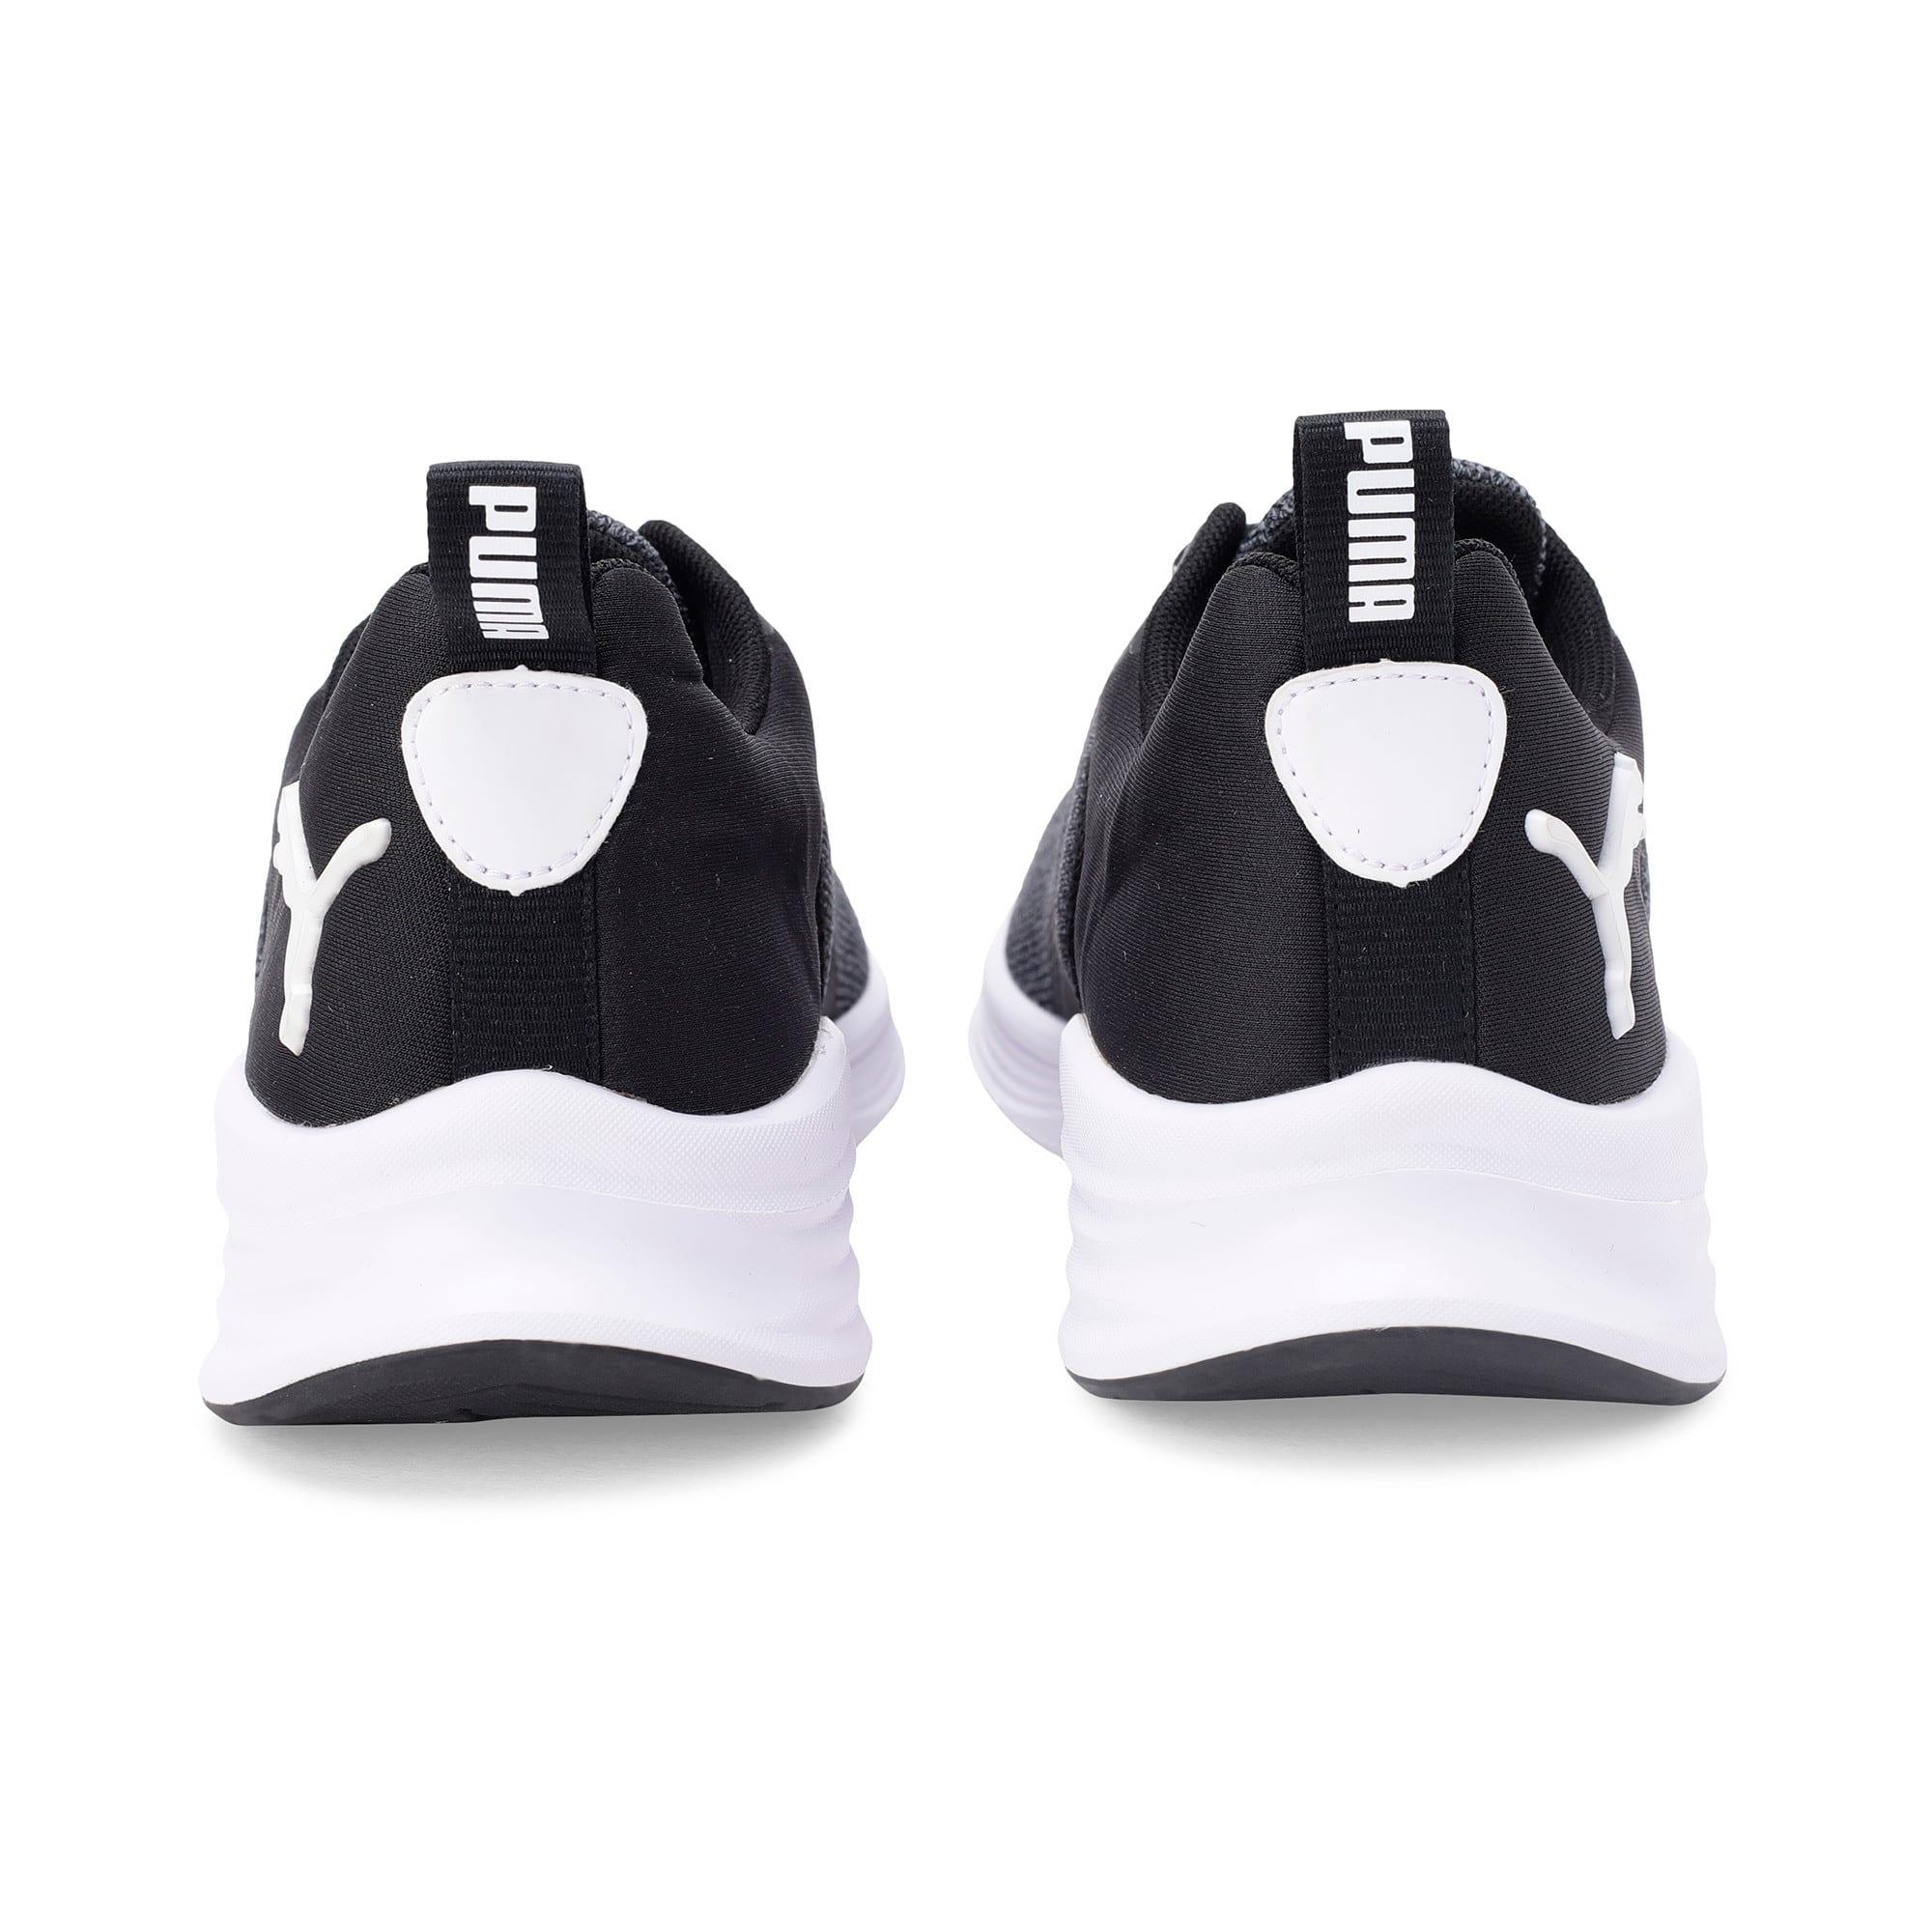 Thumbnail 3 of HYBRID Fuego evoKNIT Men's Running Shoes, CASTLEROCK-Puma Blk-Pma Wht, medium-IND